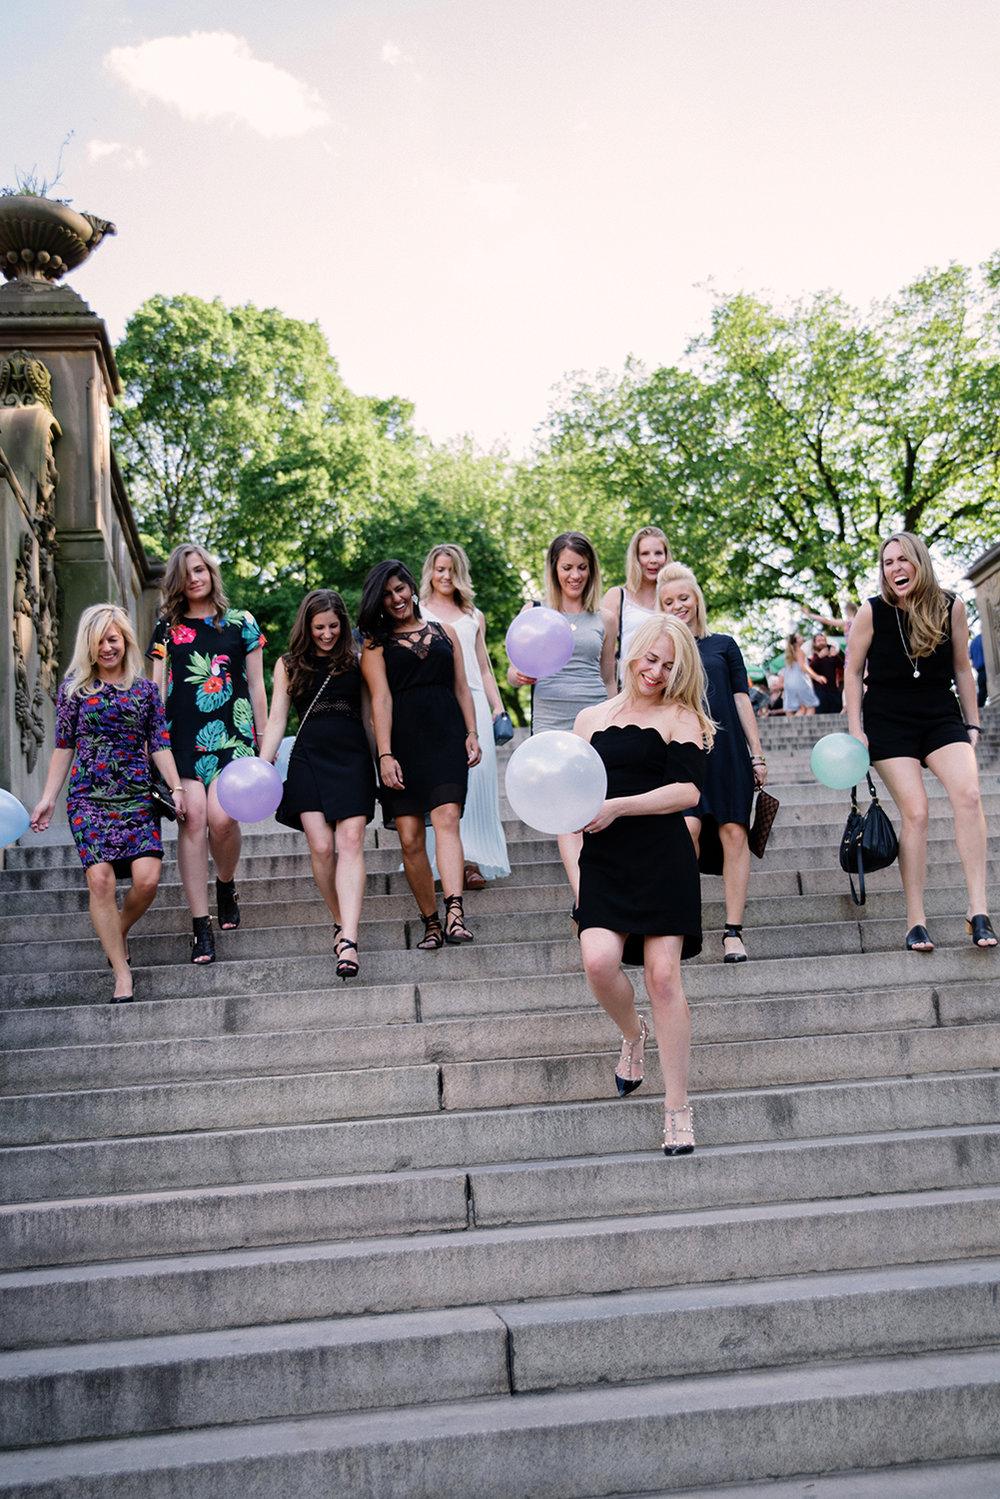 Bachelorette Party Photoshoot-Central Park-New York City- Olivia Christina Photo-12 copy.jpg